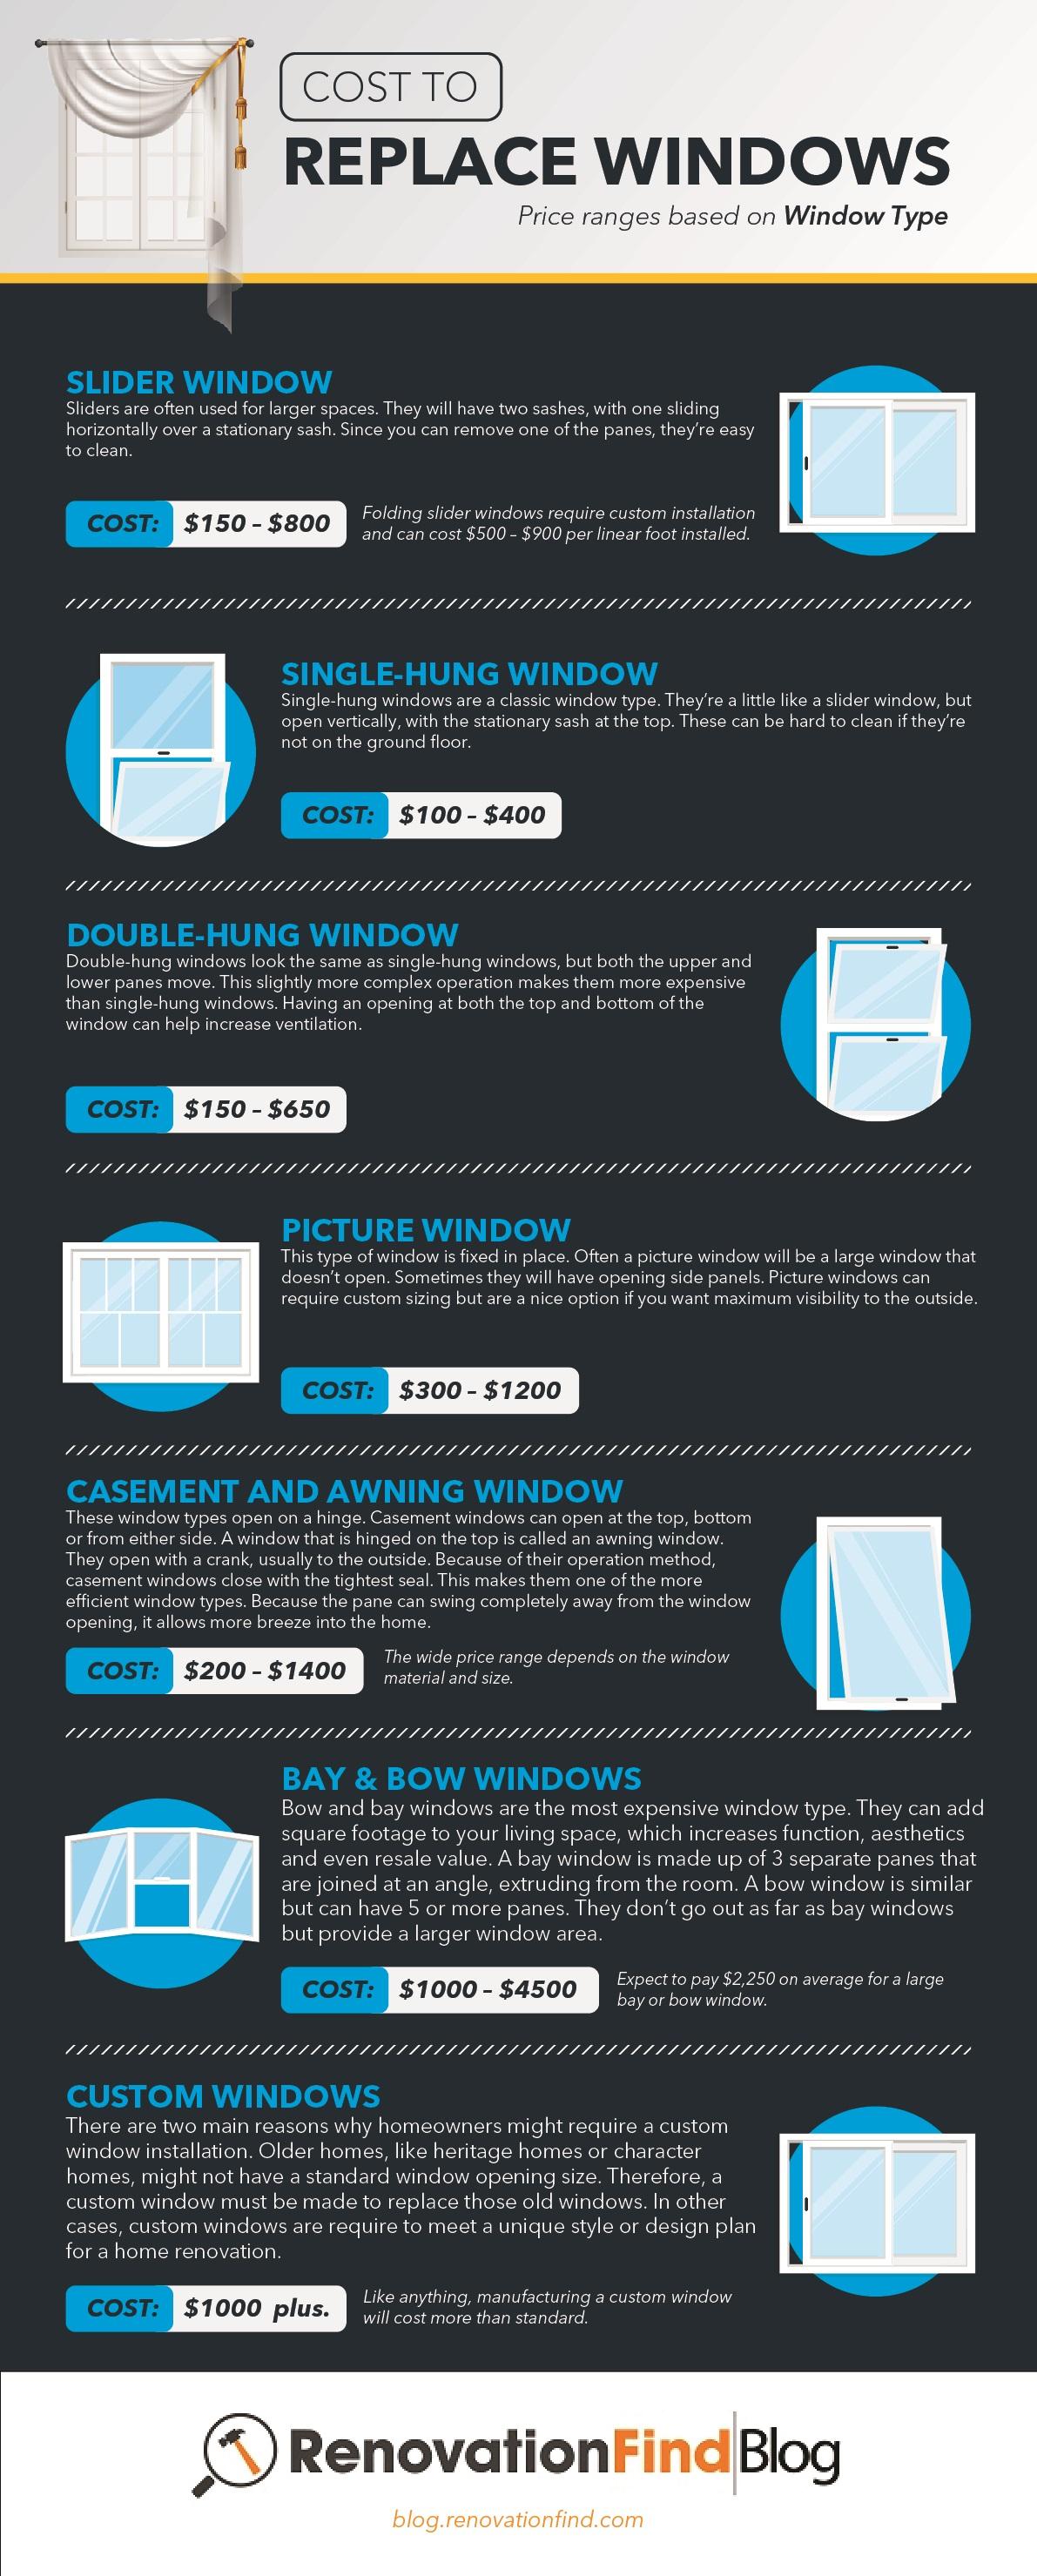 Cost of windows based on window type